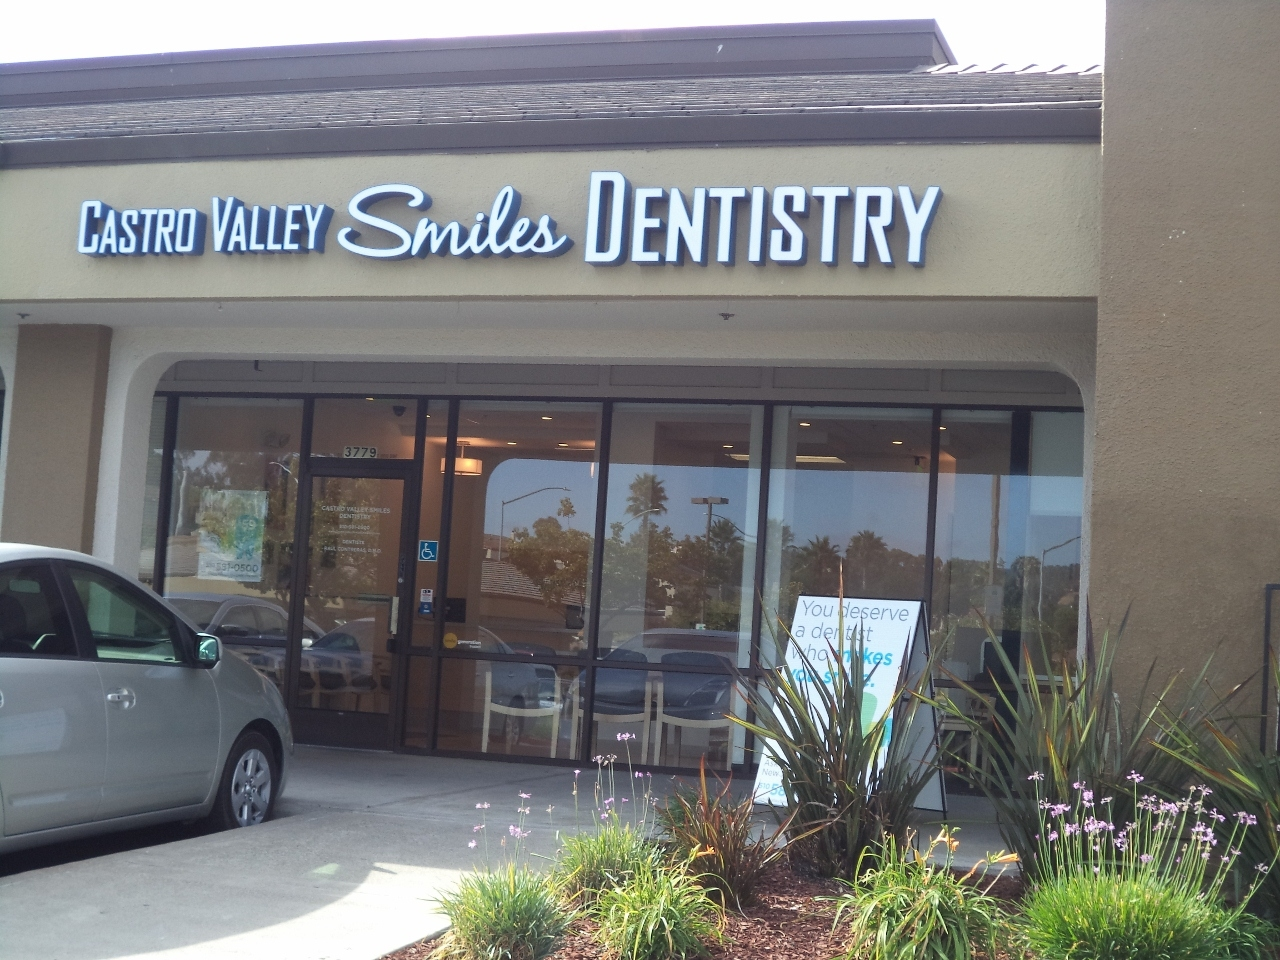 Castro Valley Smiles Dentistry image 0